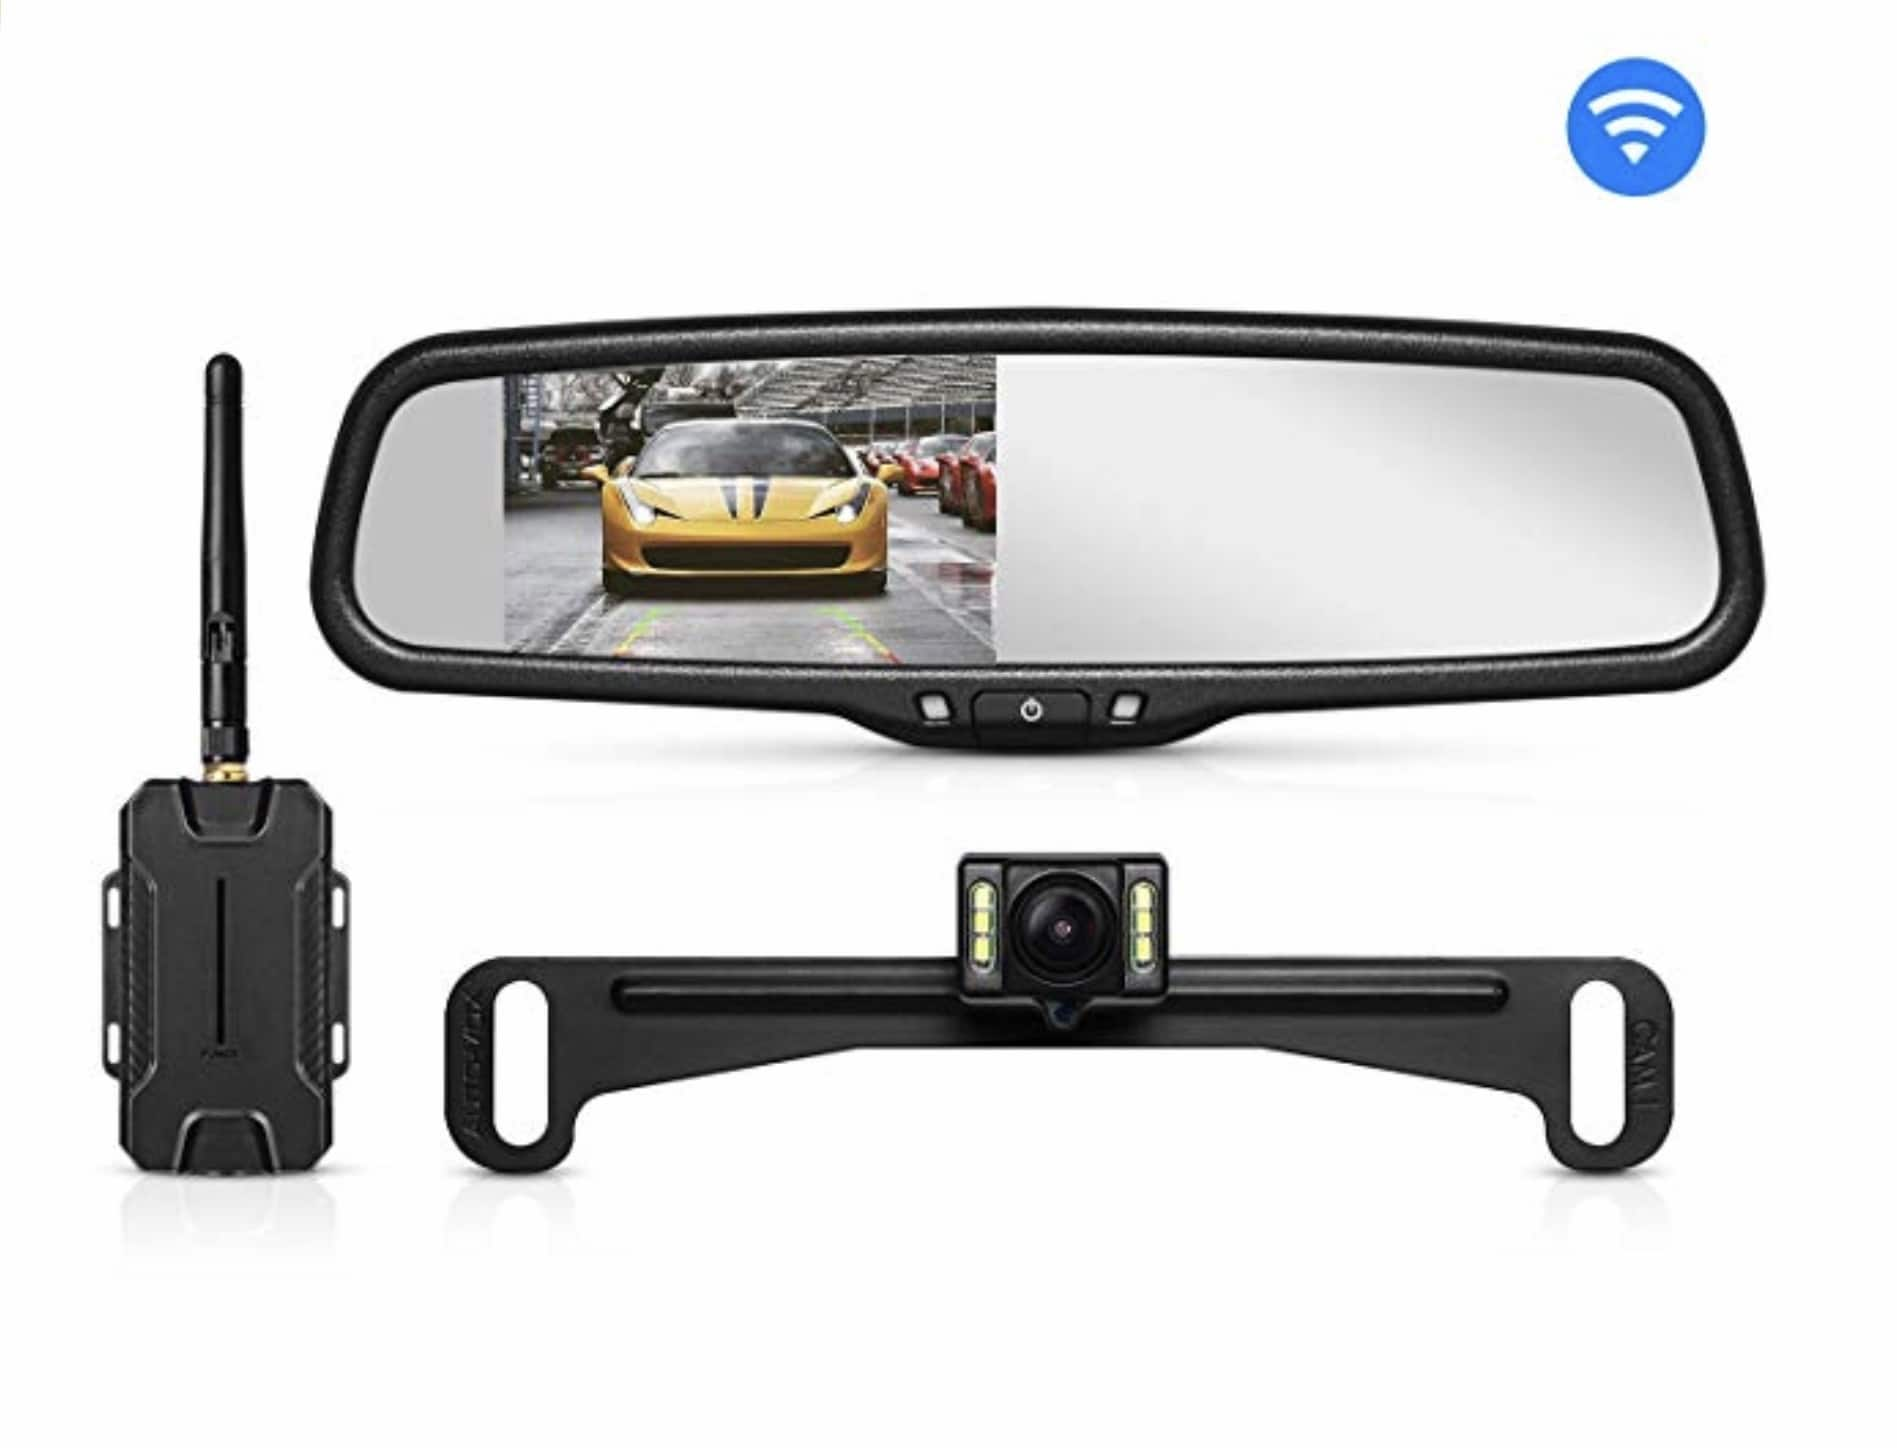 AUTO-VOX T1400U Wireless Backup Camera Kit, IP 68 Waterproof with 4.3 in LCD - $96.55@Amazon